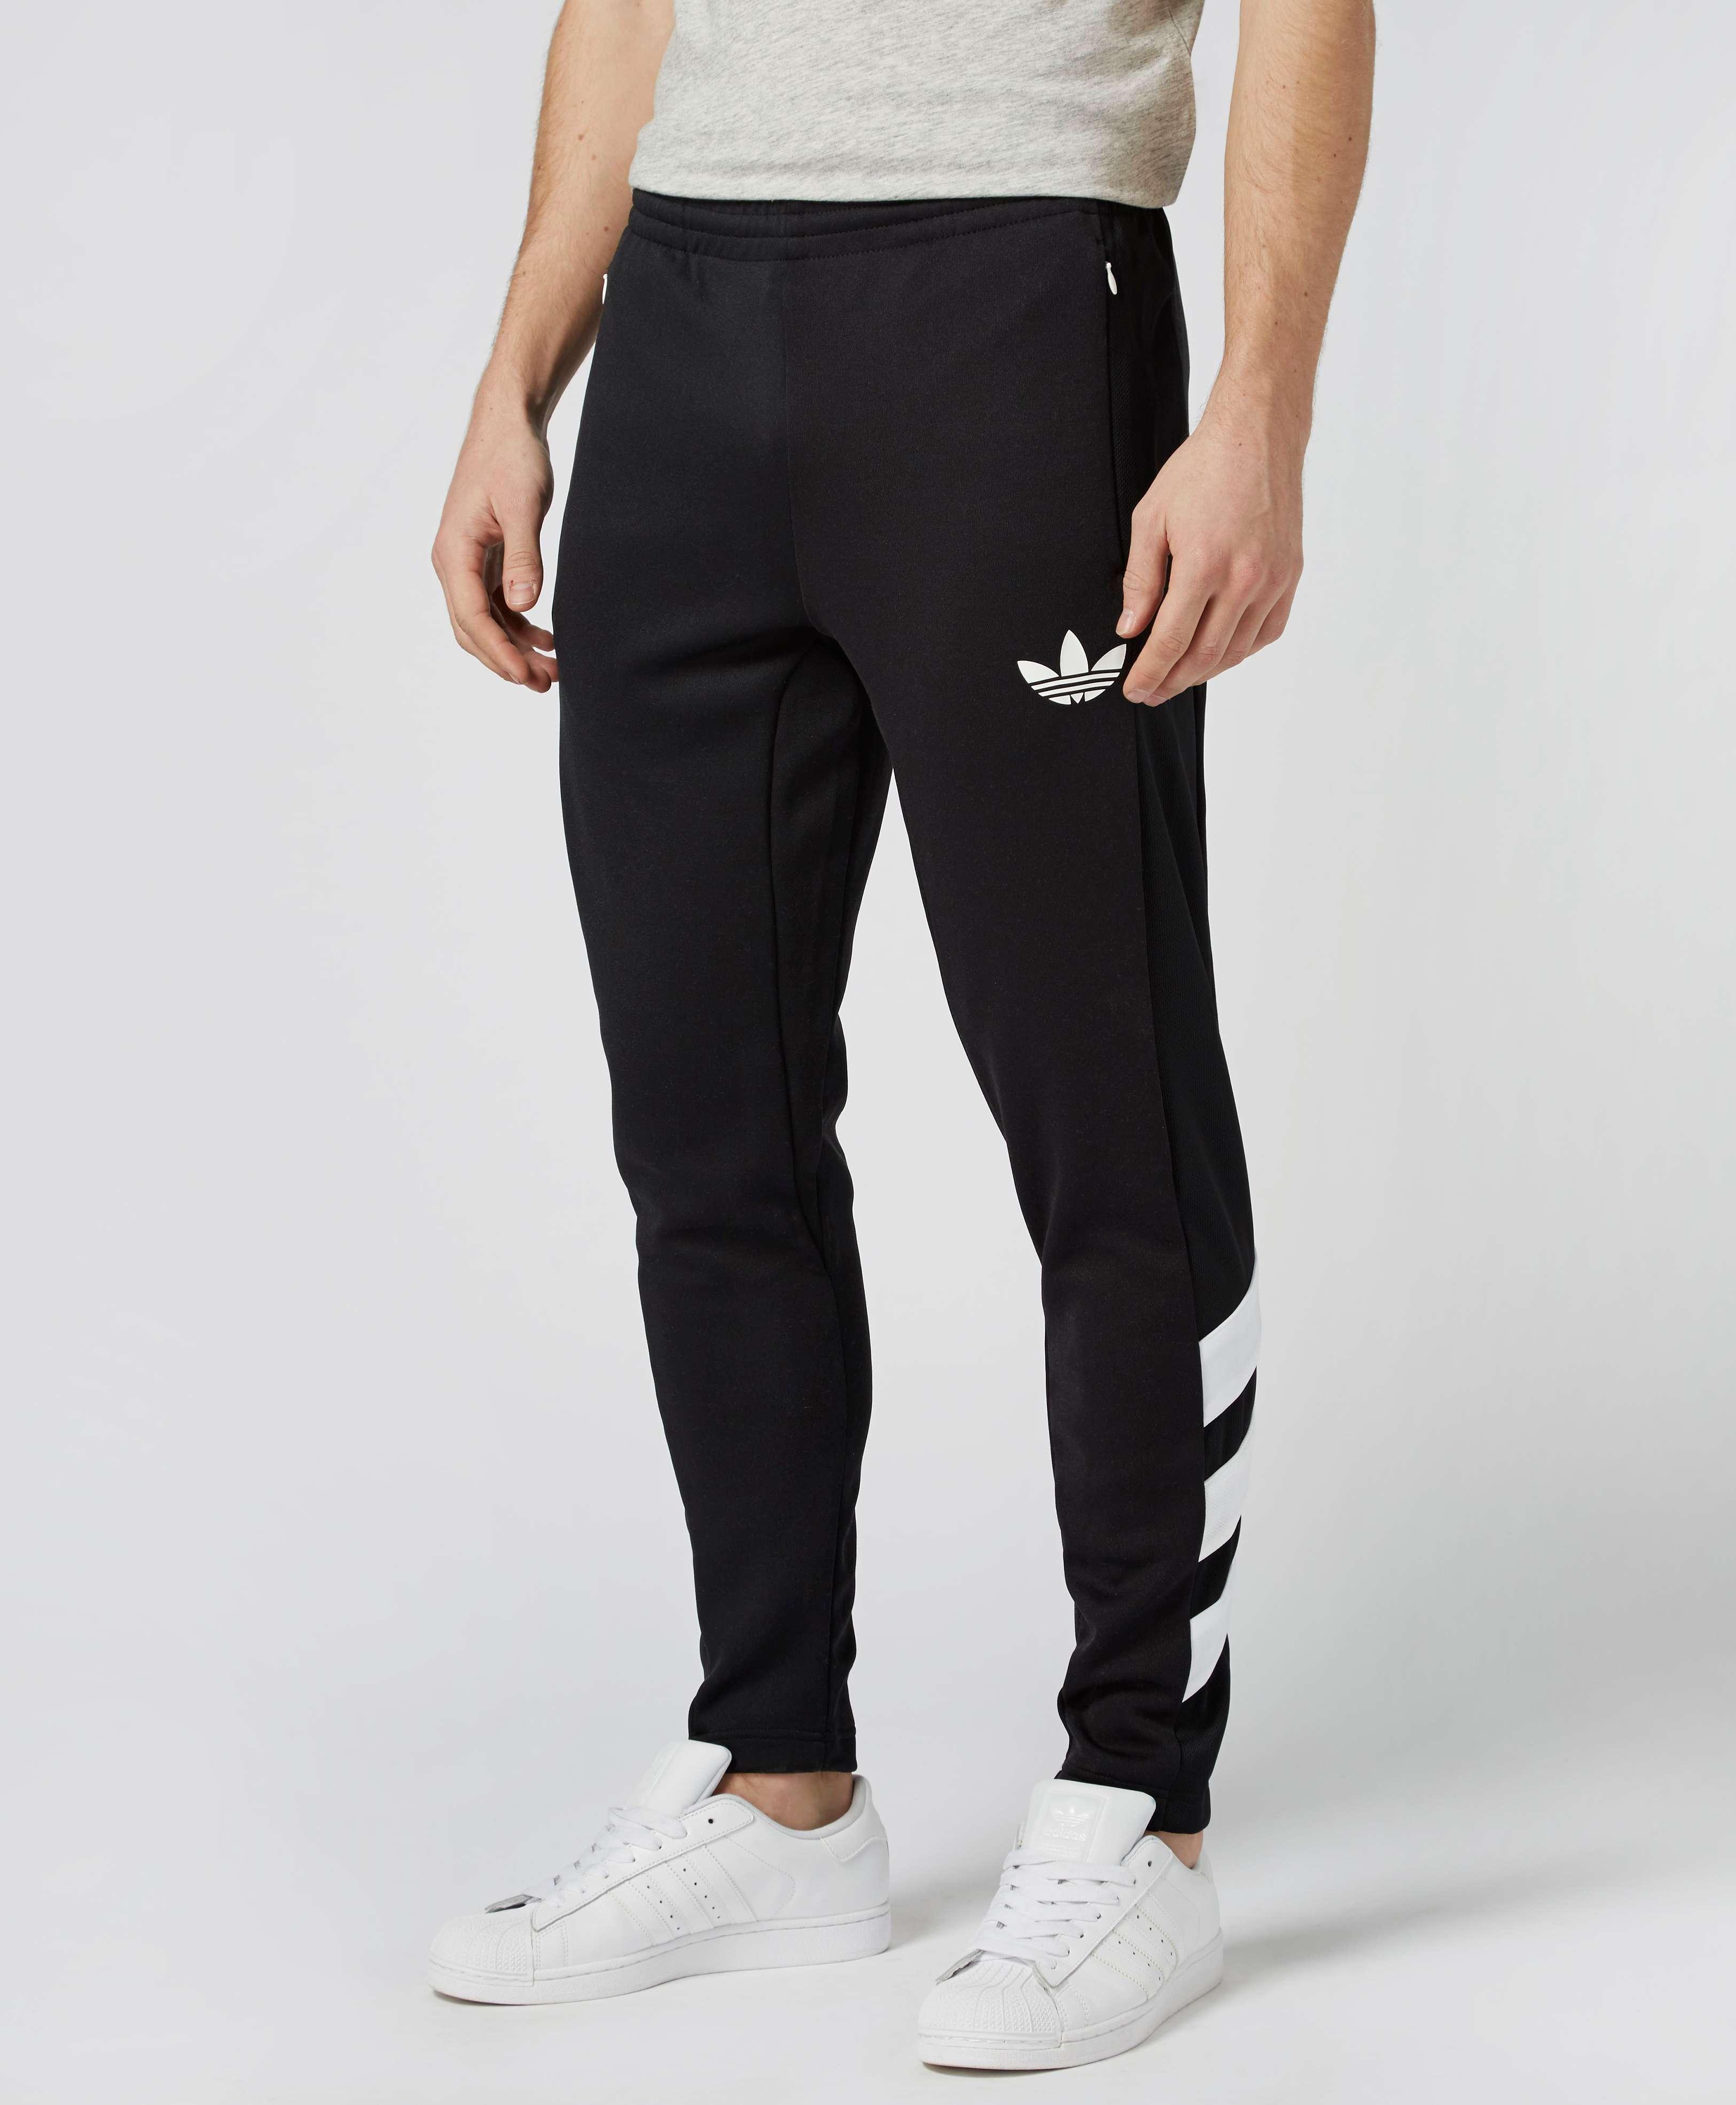 Adidas Originals Slim Retro Track Pants Scotts Menswear